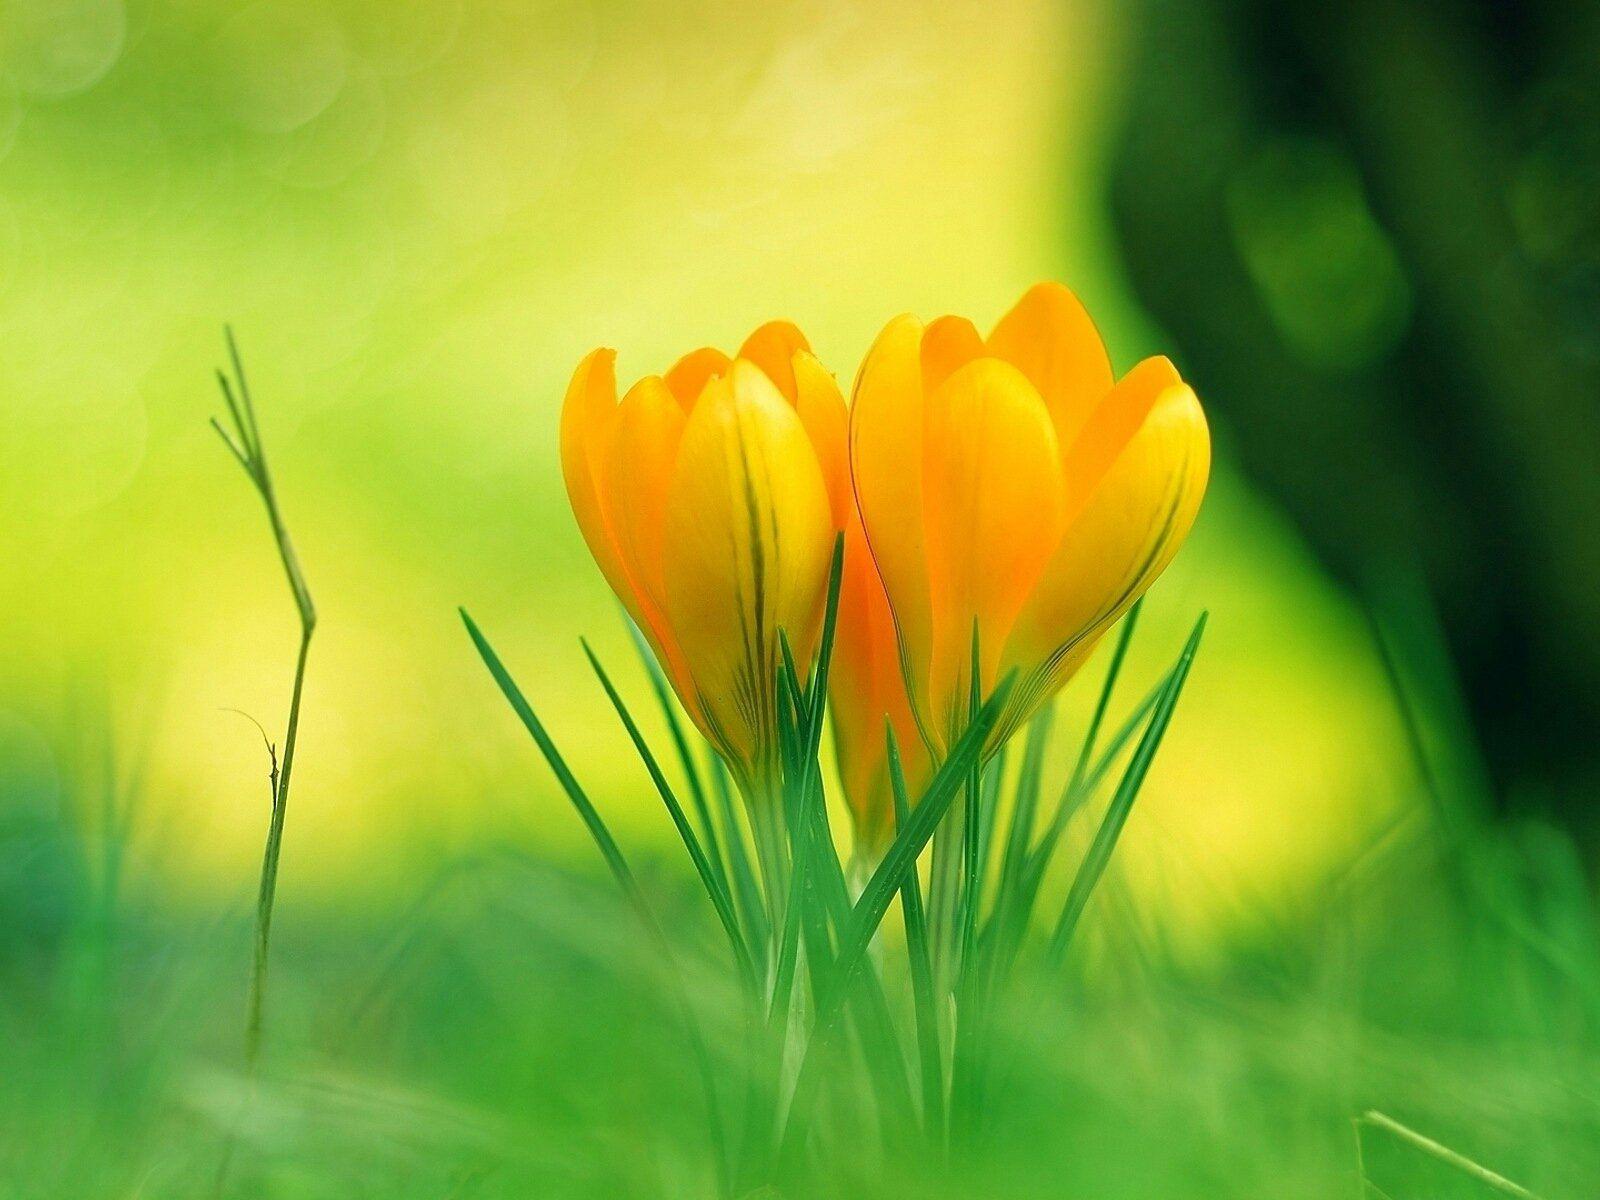 Yellow Crocuses Flowers Pinterest Yellow Crocus Flowers And